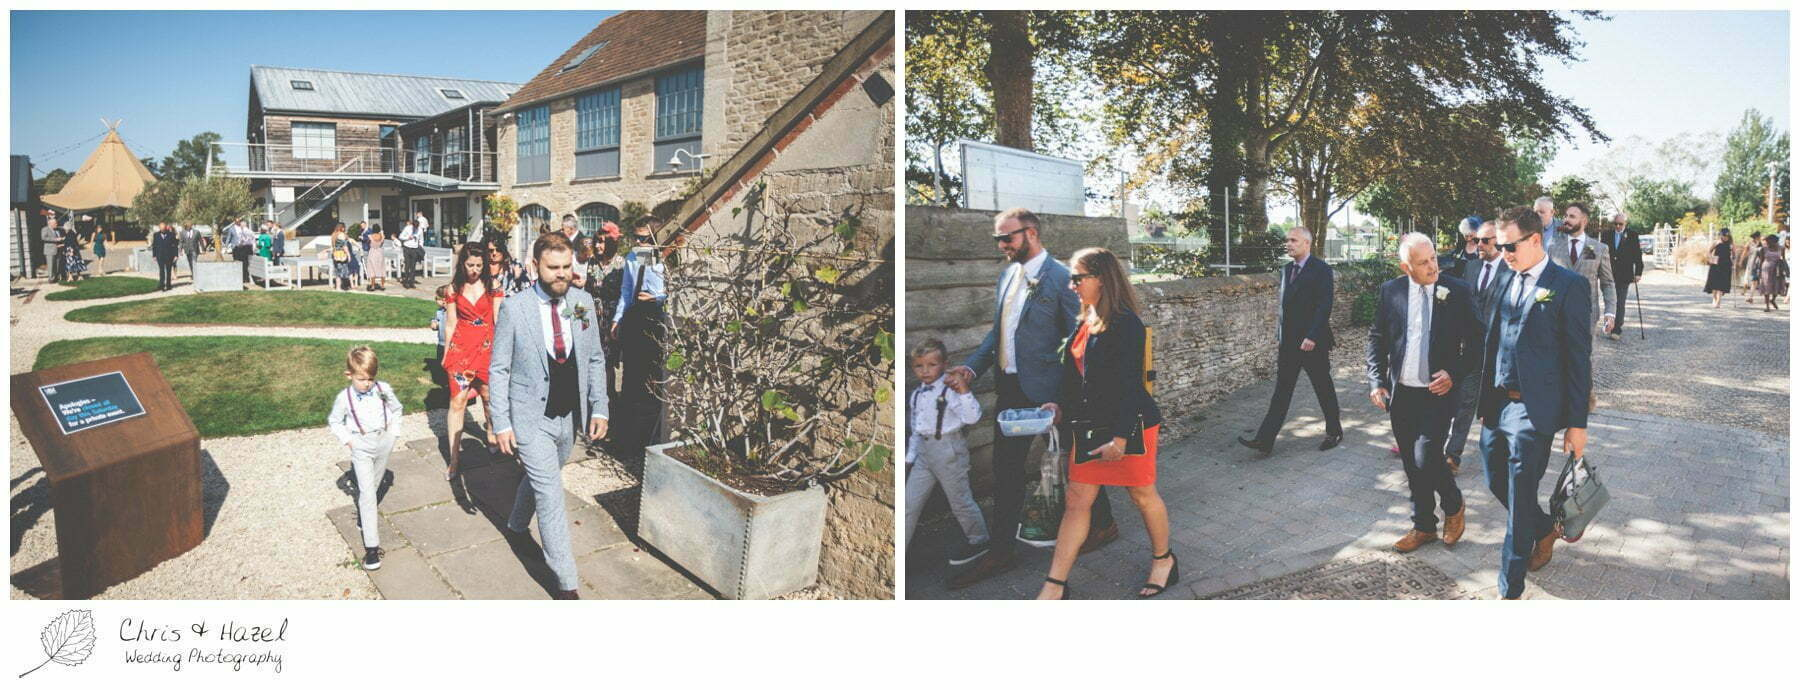 Wedding Guests leaving The Glove Factory Wedding Photography, Wiltshire Wedding Photographer Trowbridge, Chris and Hazel Wedding Photography